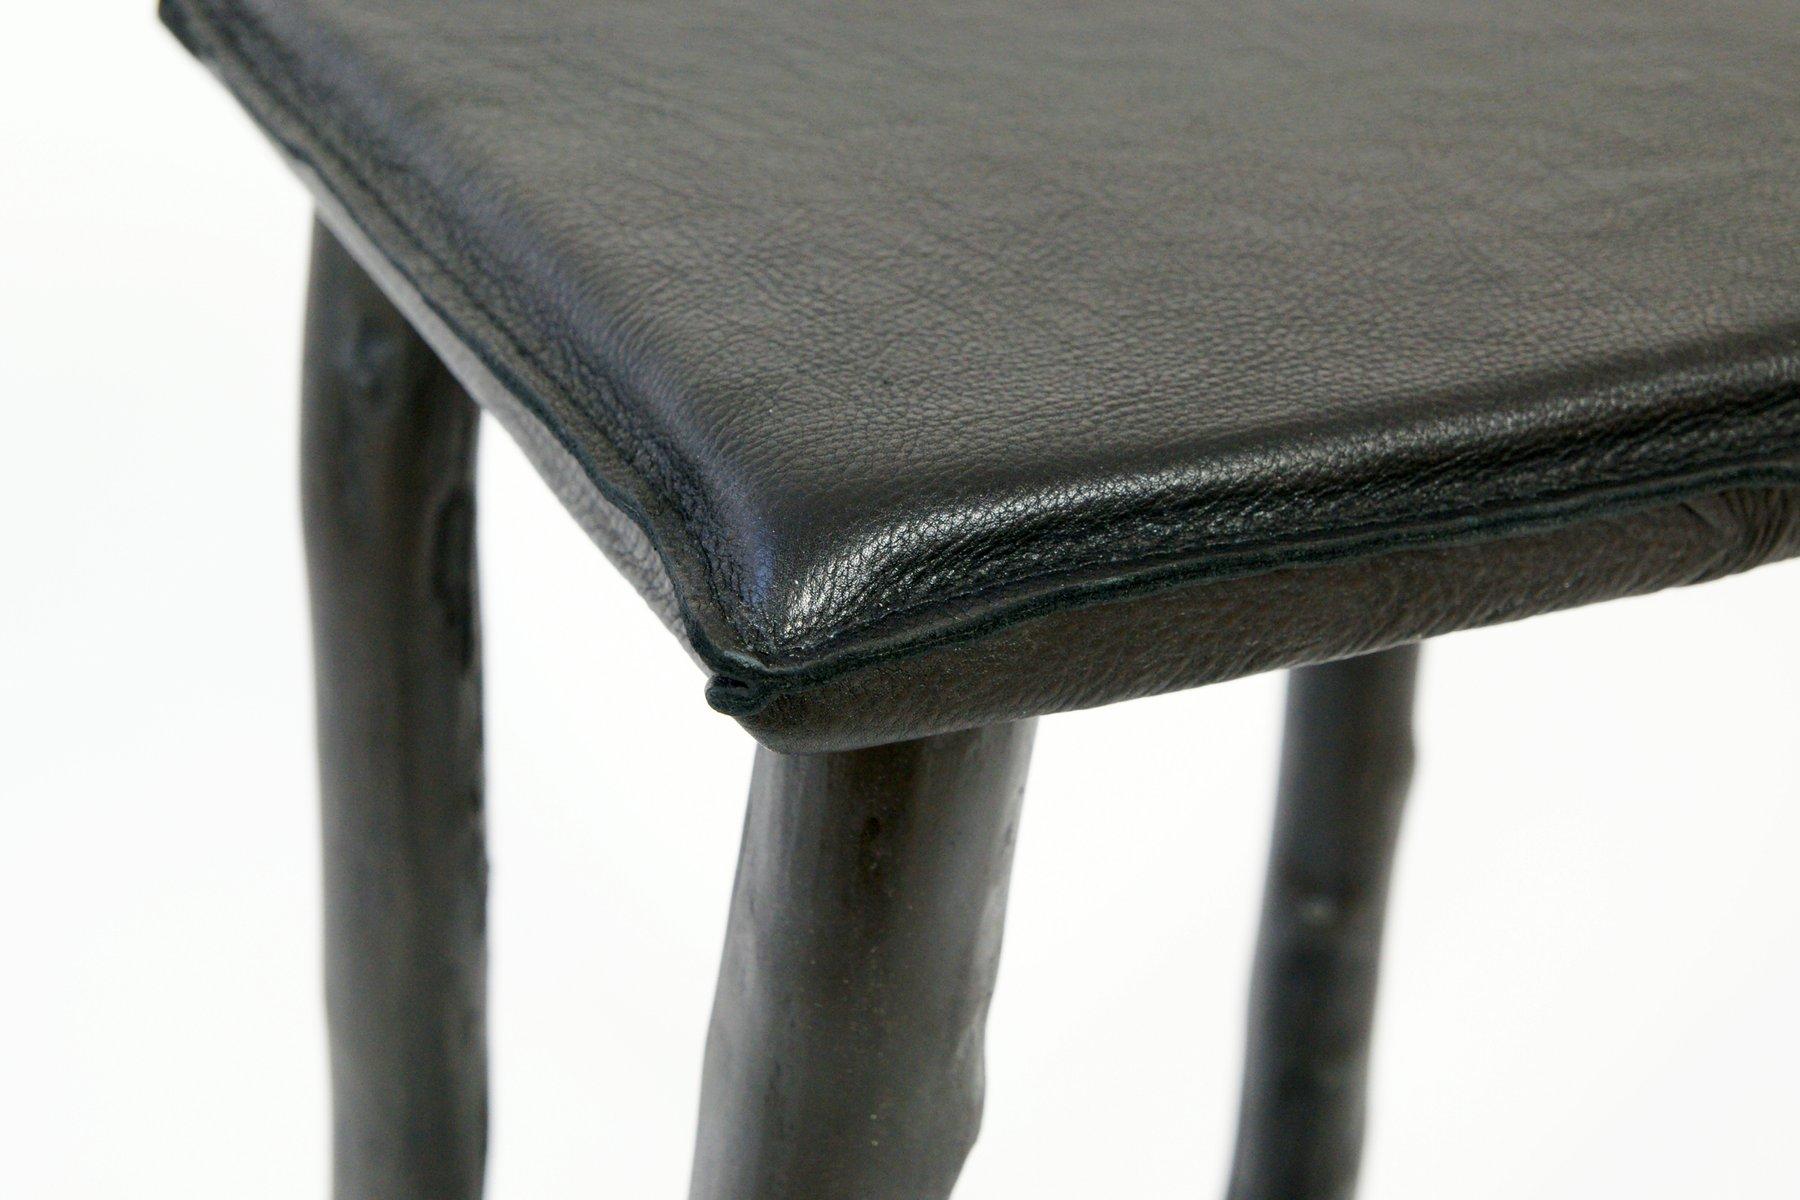 Ghisa sgabello da bar legno rustico sedile vintage industriale